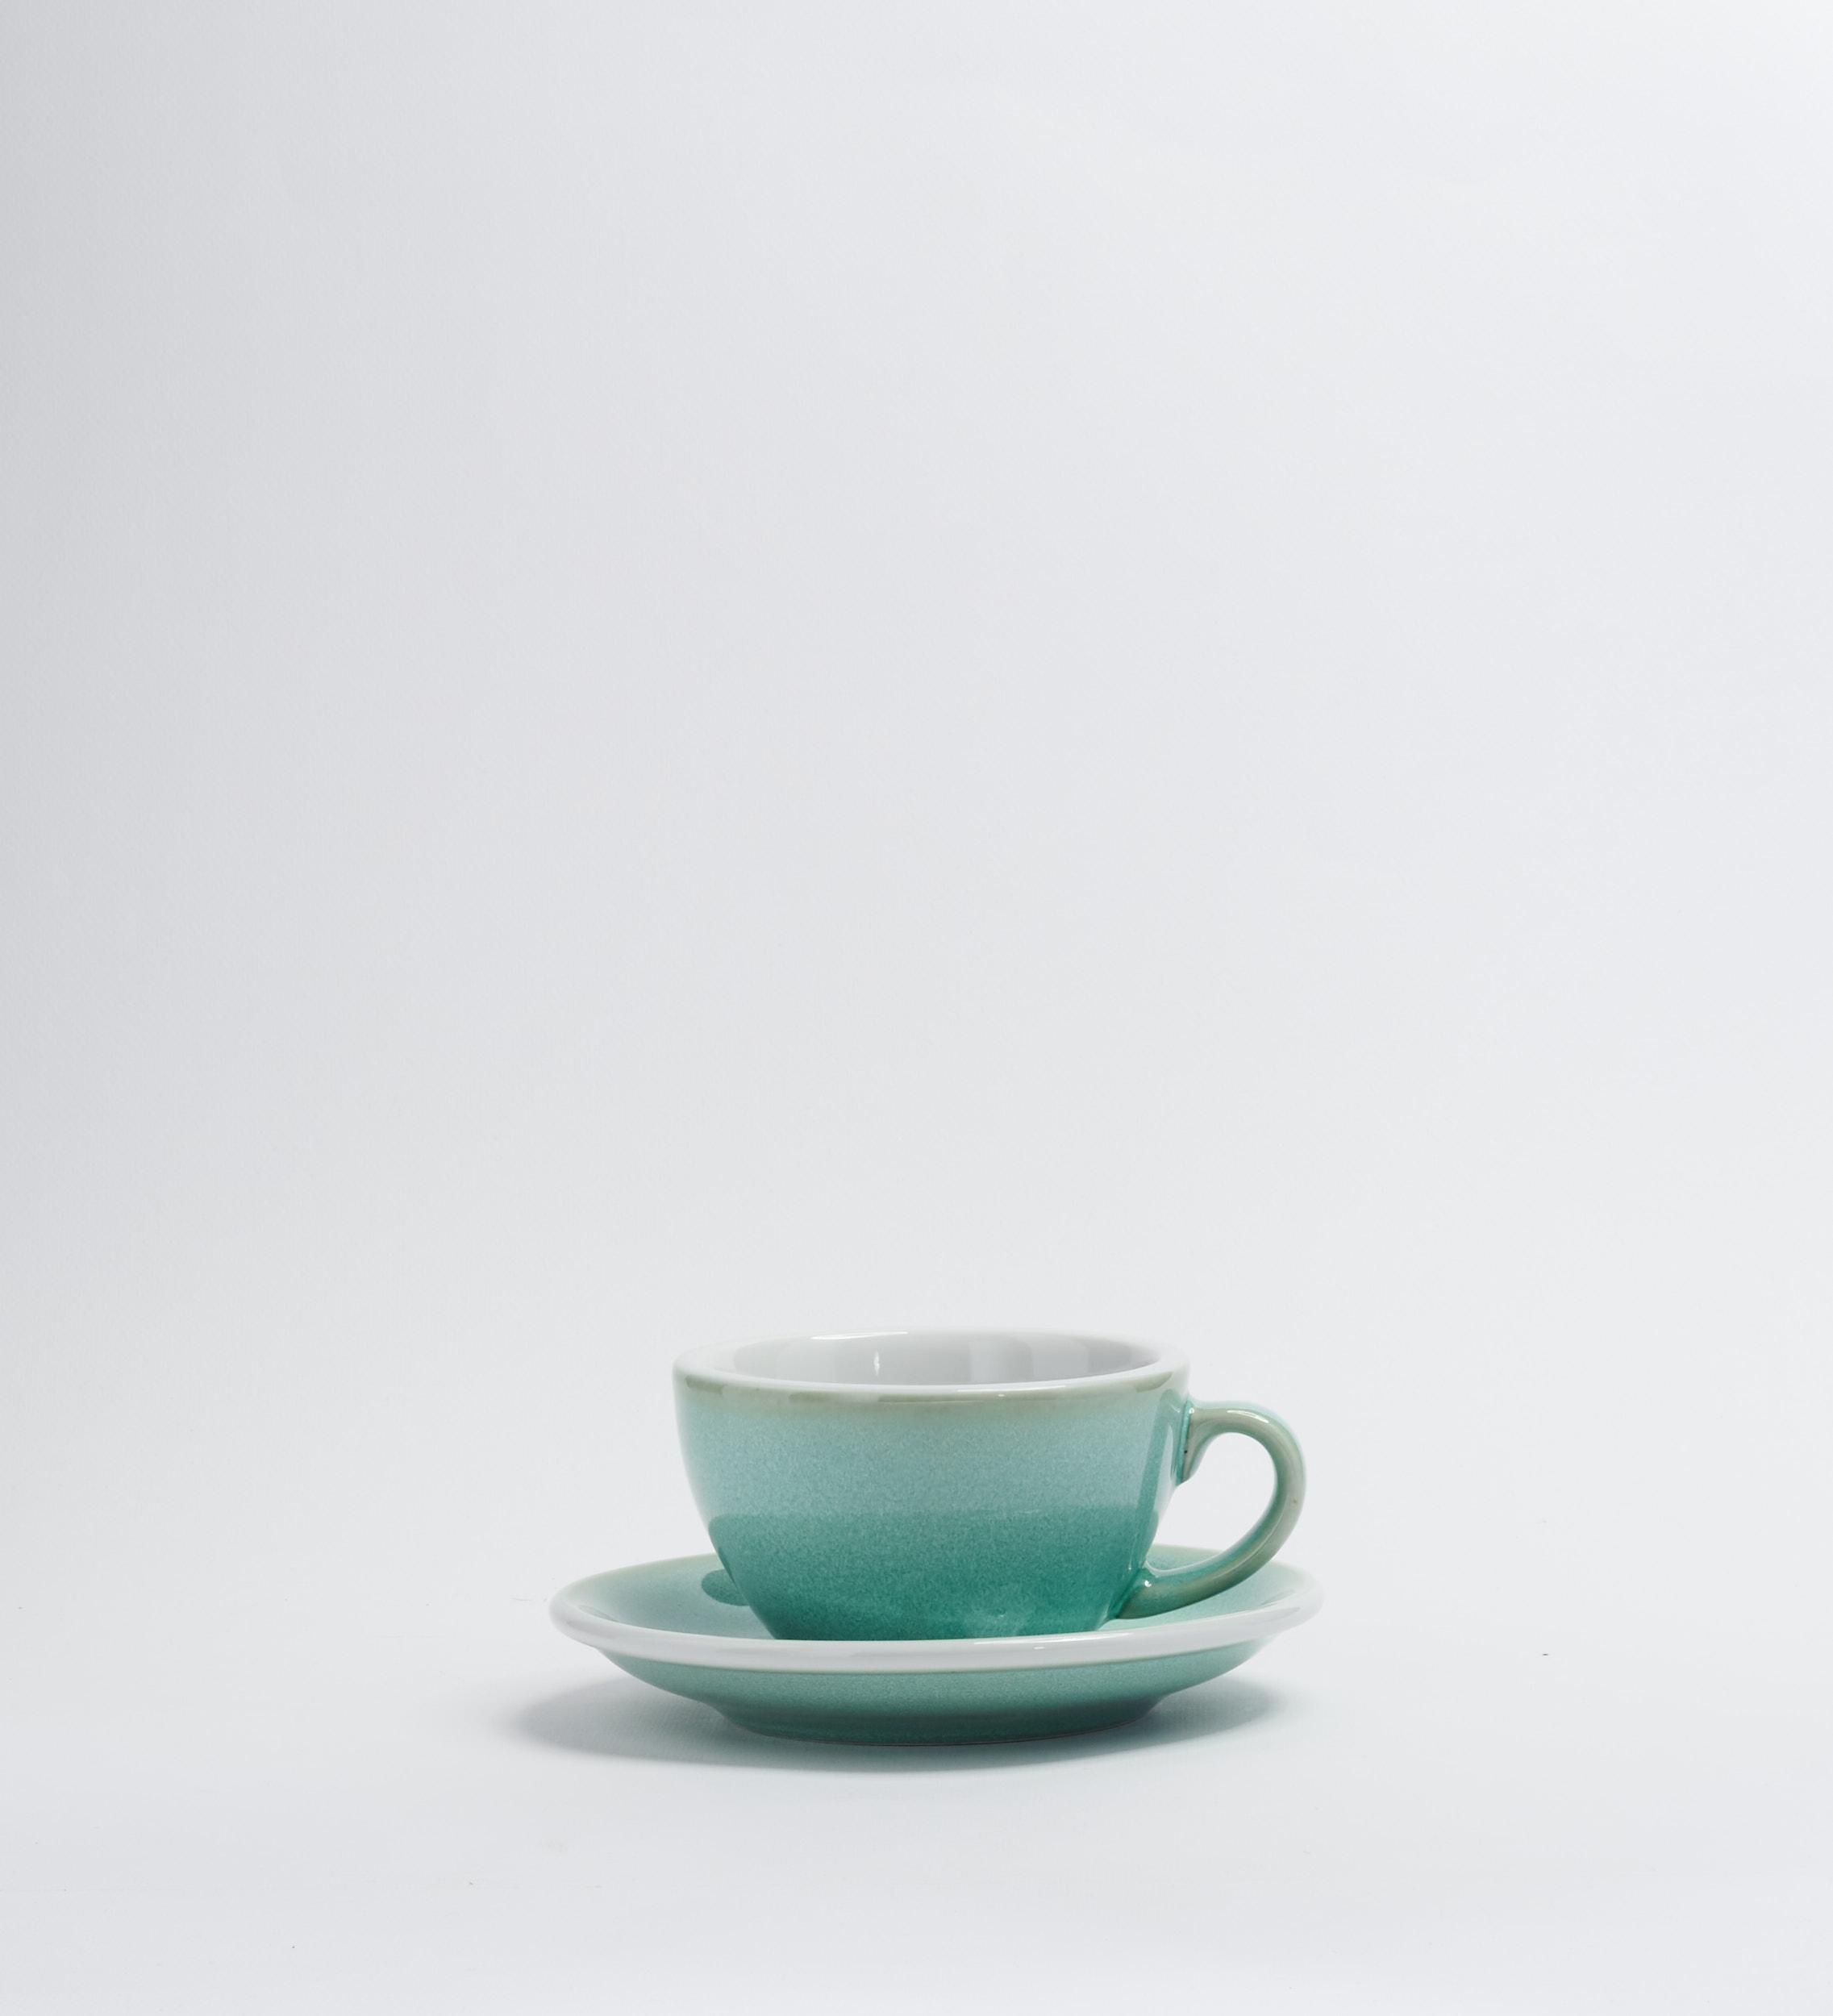 Egg Tassen Cappuccino, 200ml-prev-1